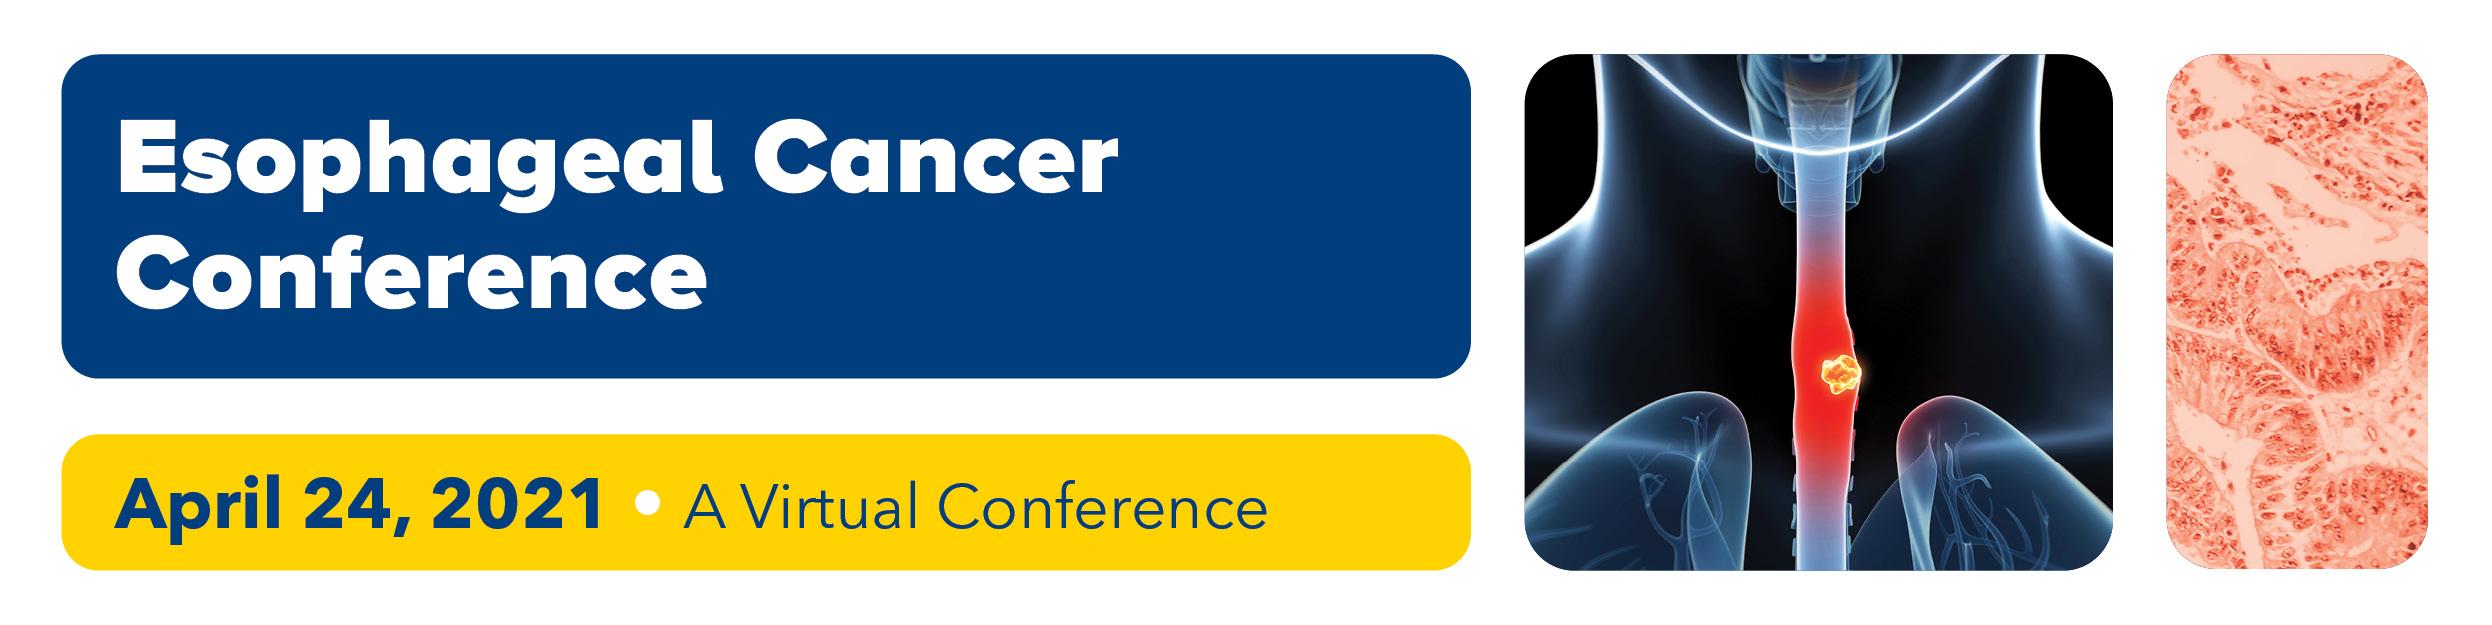 Esophageal Cancer Conference 2021 Banner